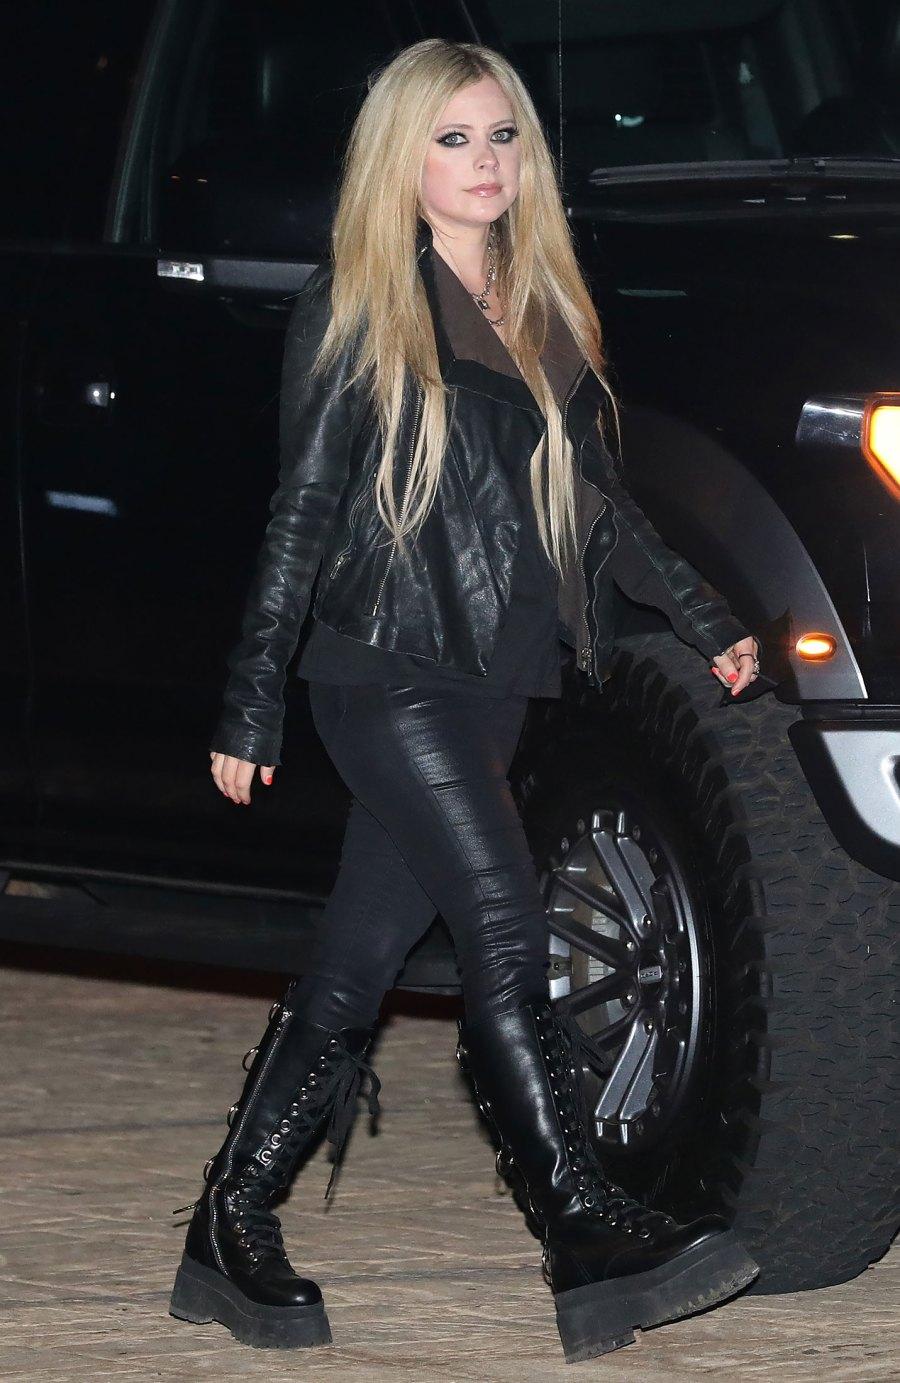 Avril Lavigne May 2, 2021